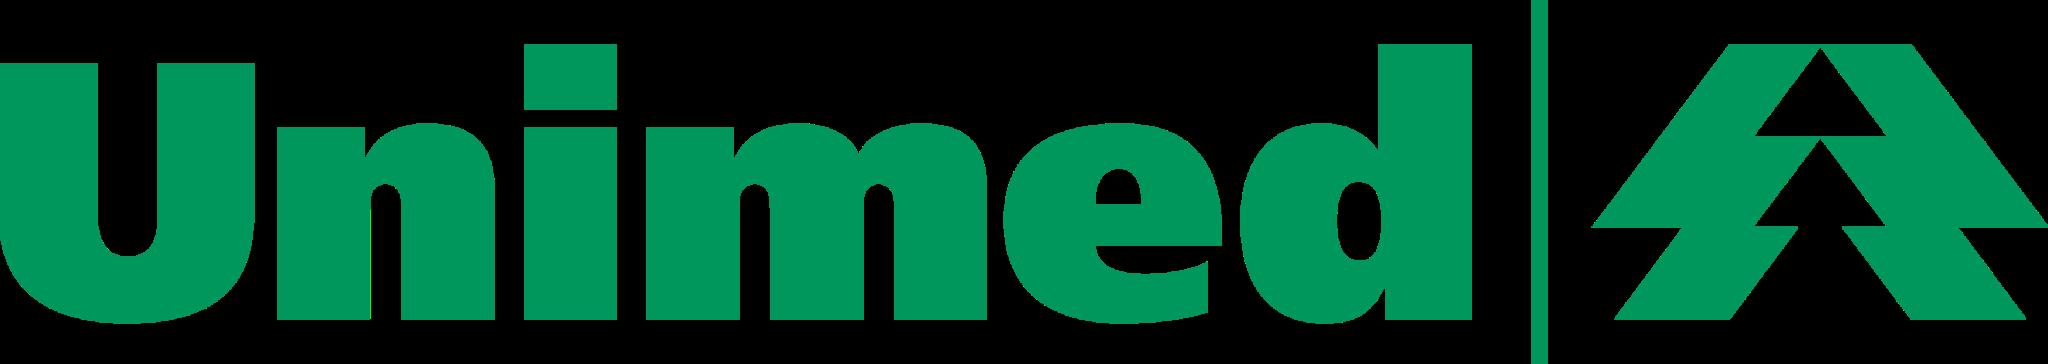 unimed-logo-1-1.png